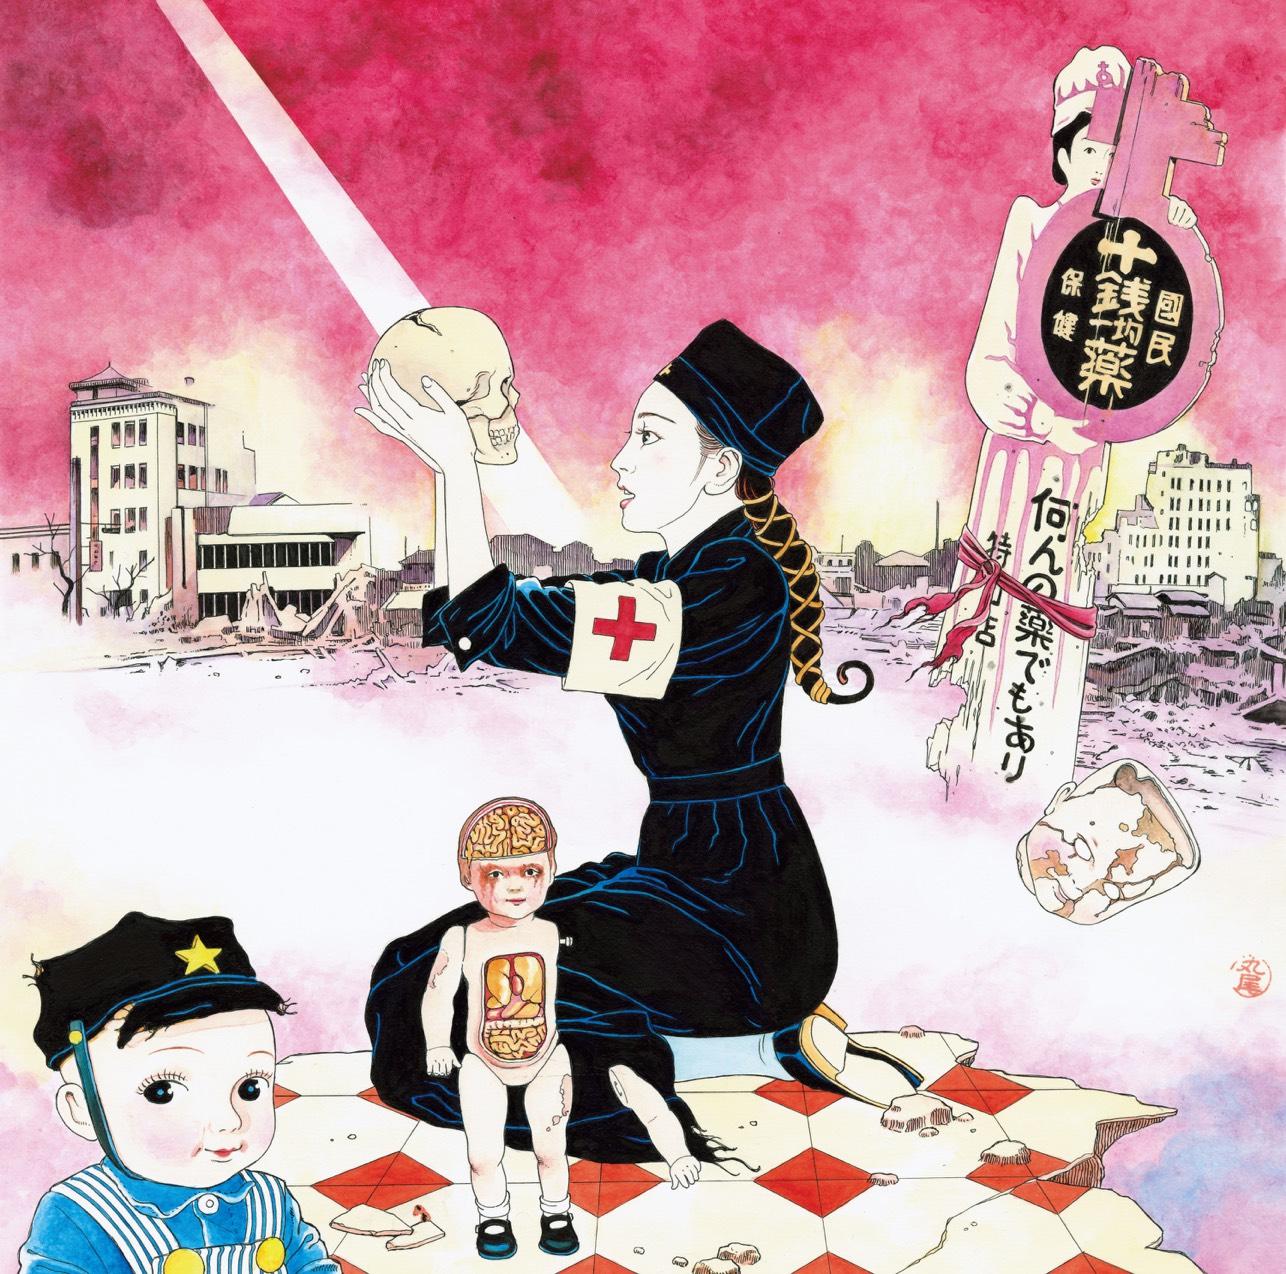 RMMS-Urbangarde-Shoujo-Gannen-MV-5-album-jacket